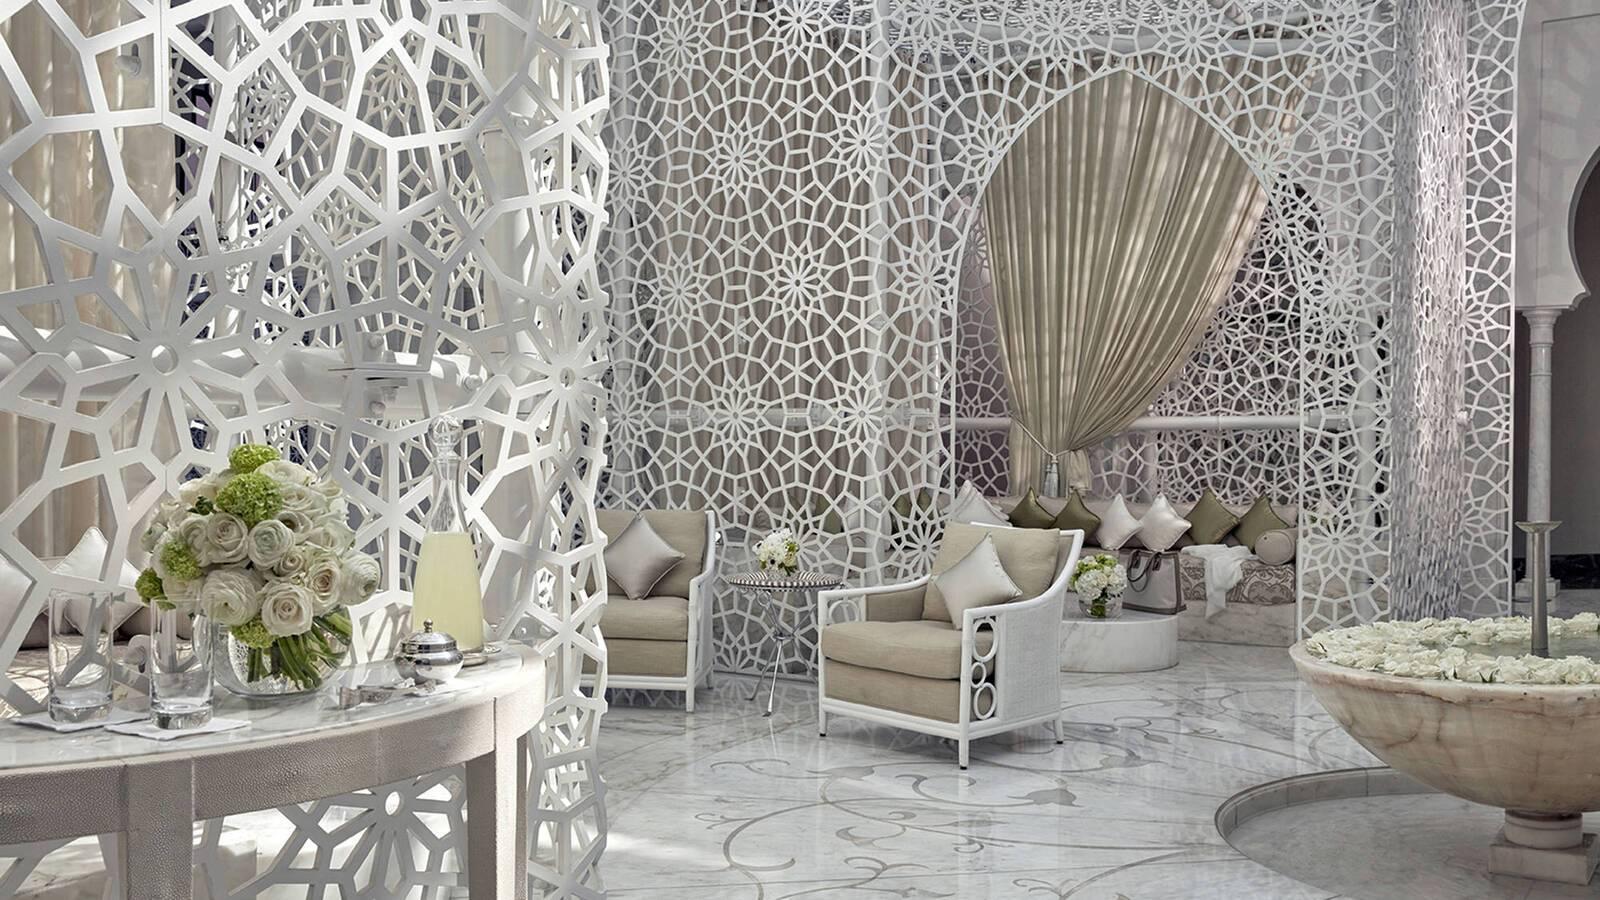 Royal Mansour Spa Marrakech Maroc